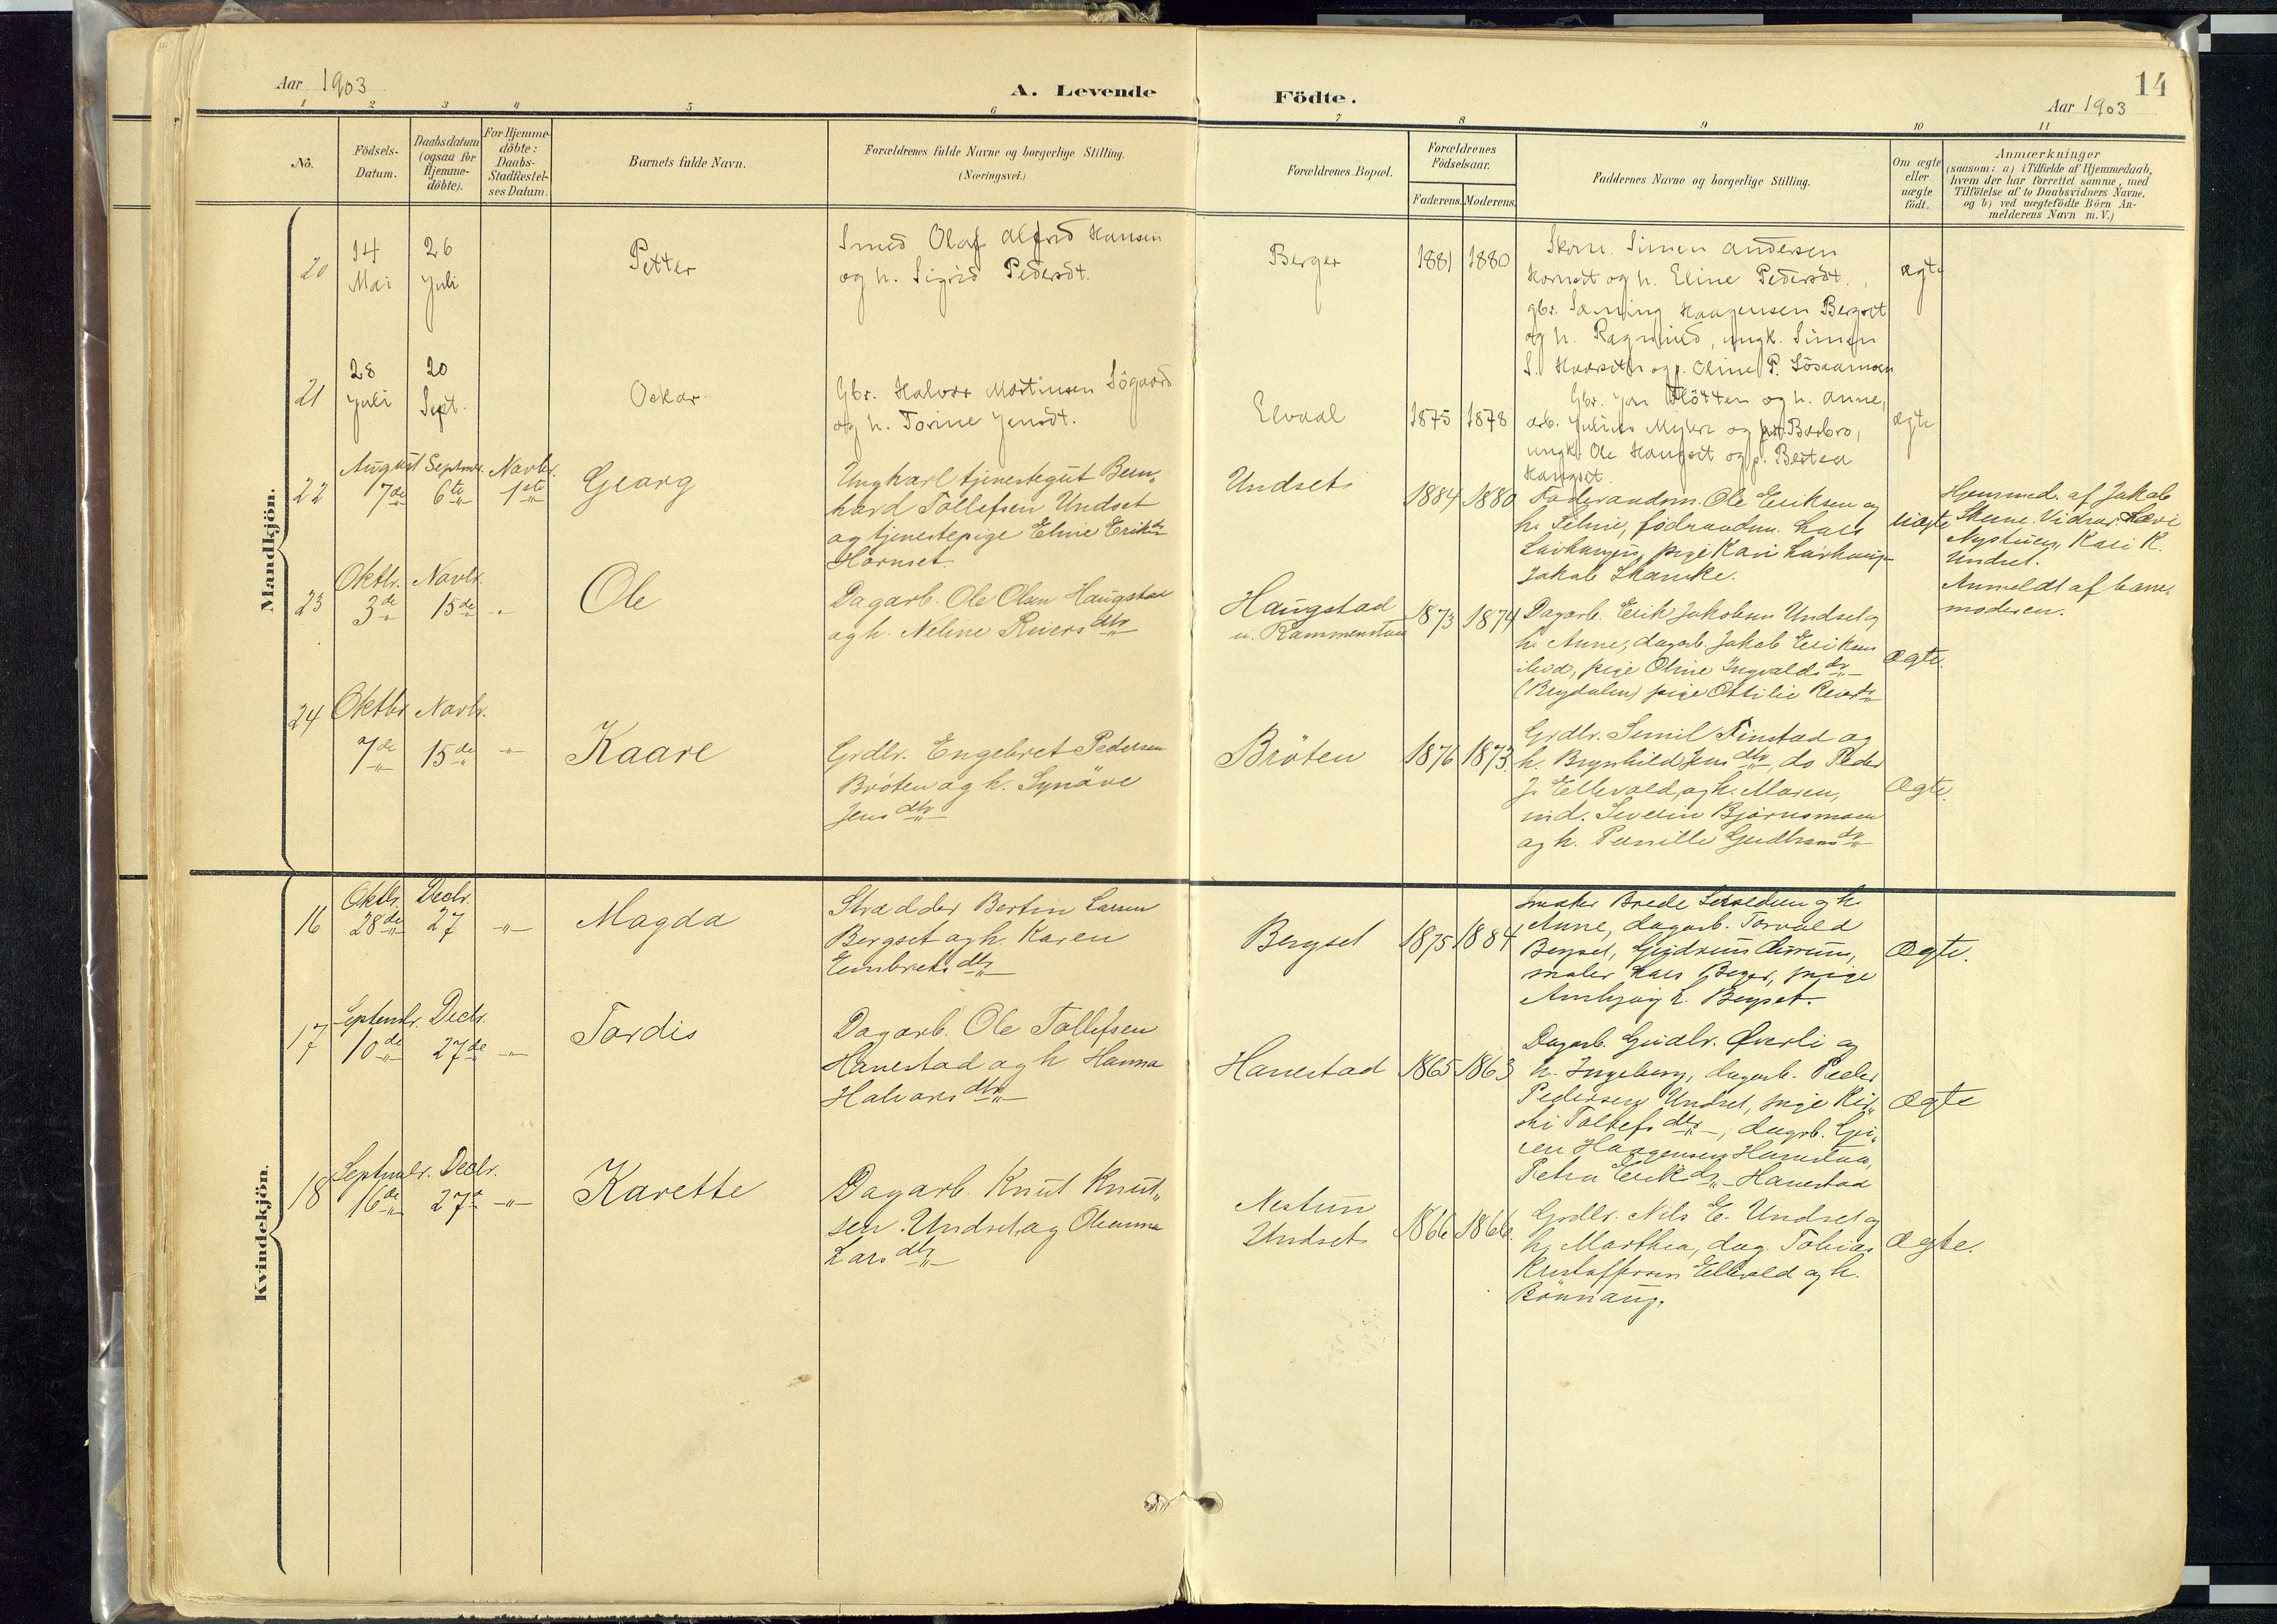 SAH, Rendalen prestekontor, H/Ha/Haa: Parish register (official) no. 12, 1901-1928, p. 14